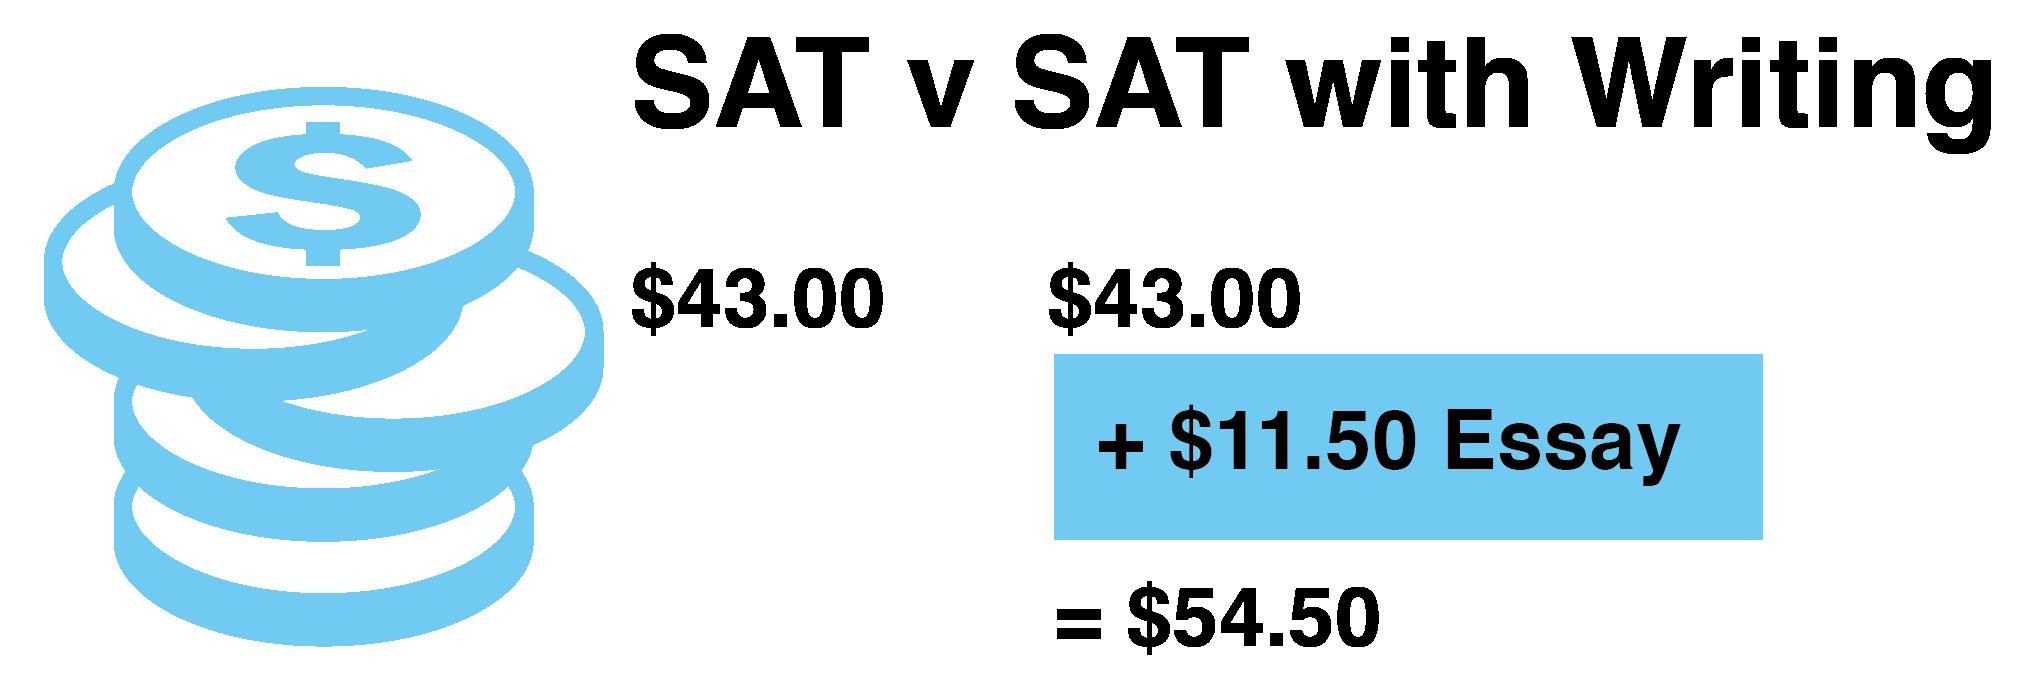 SAT essay money-01